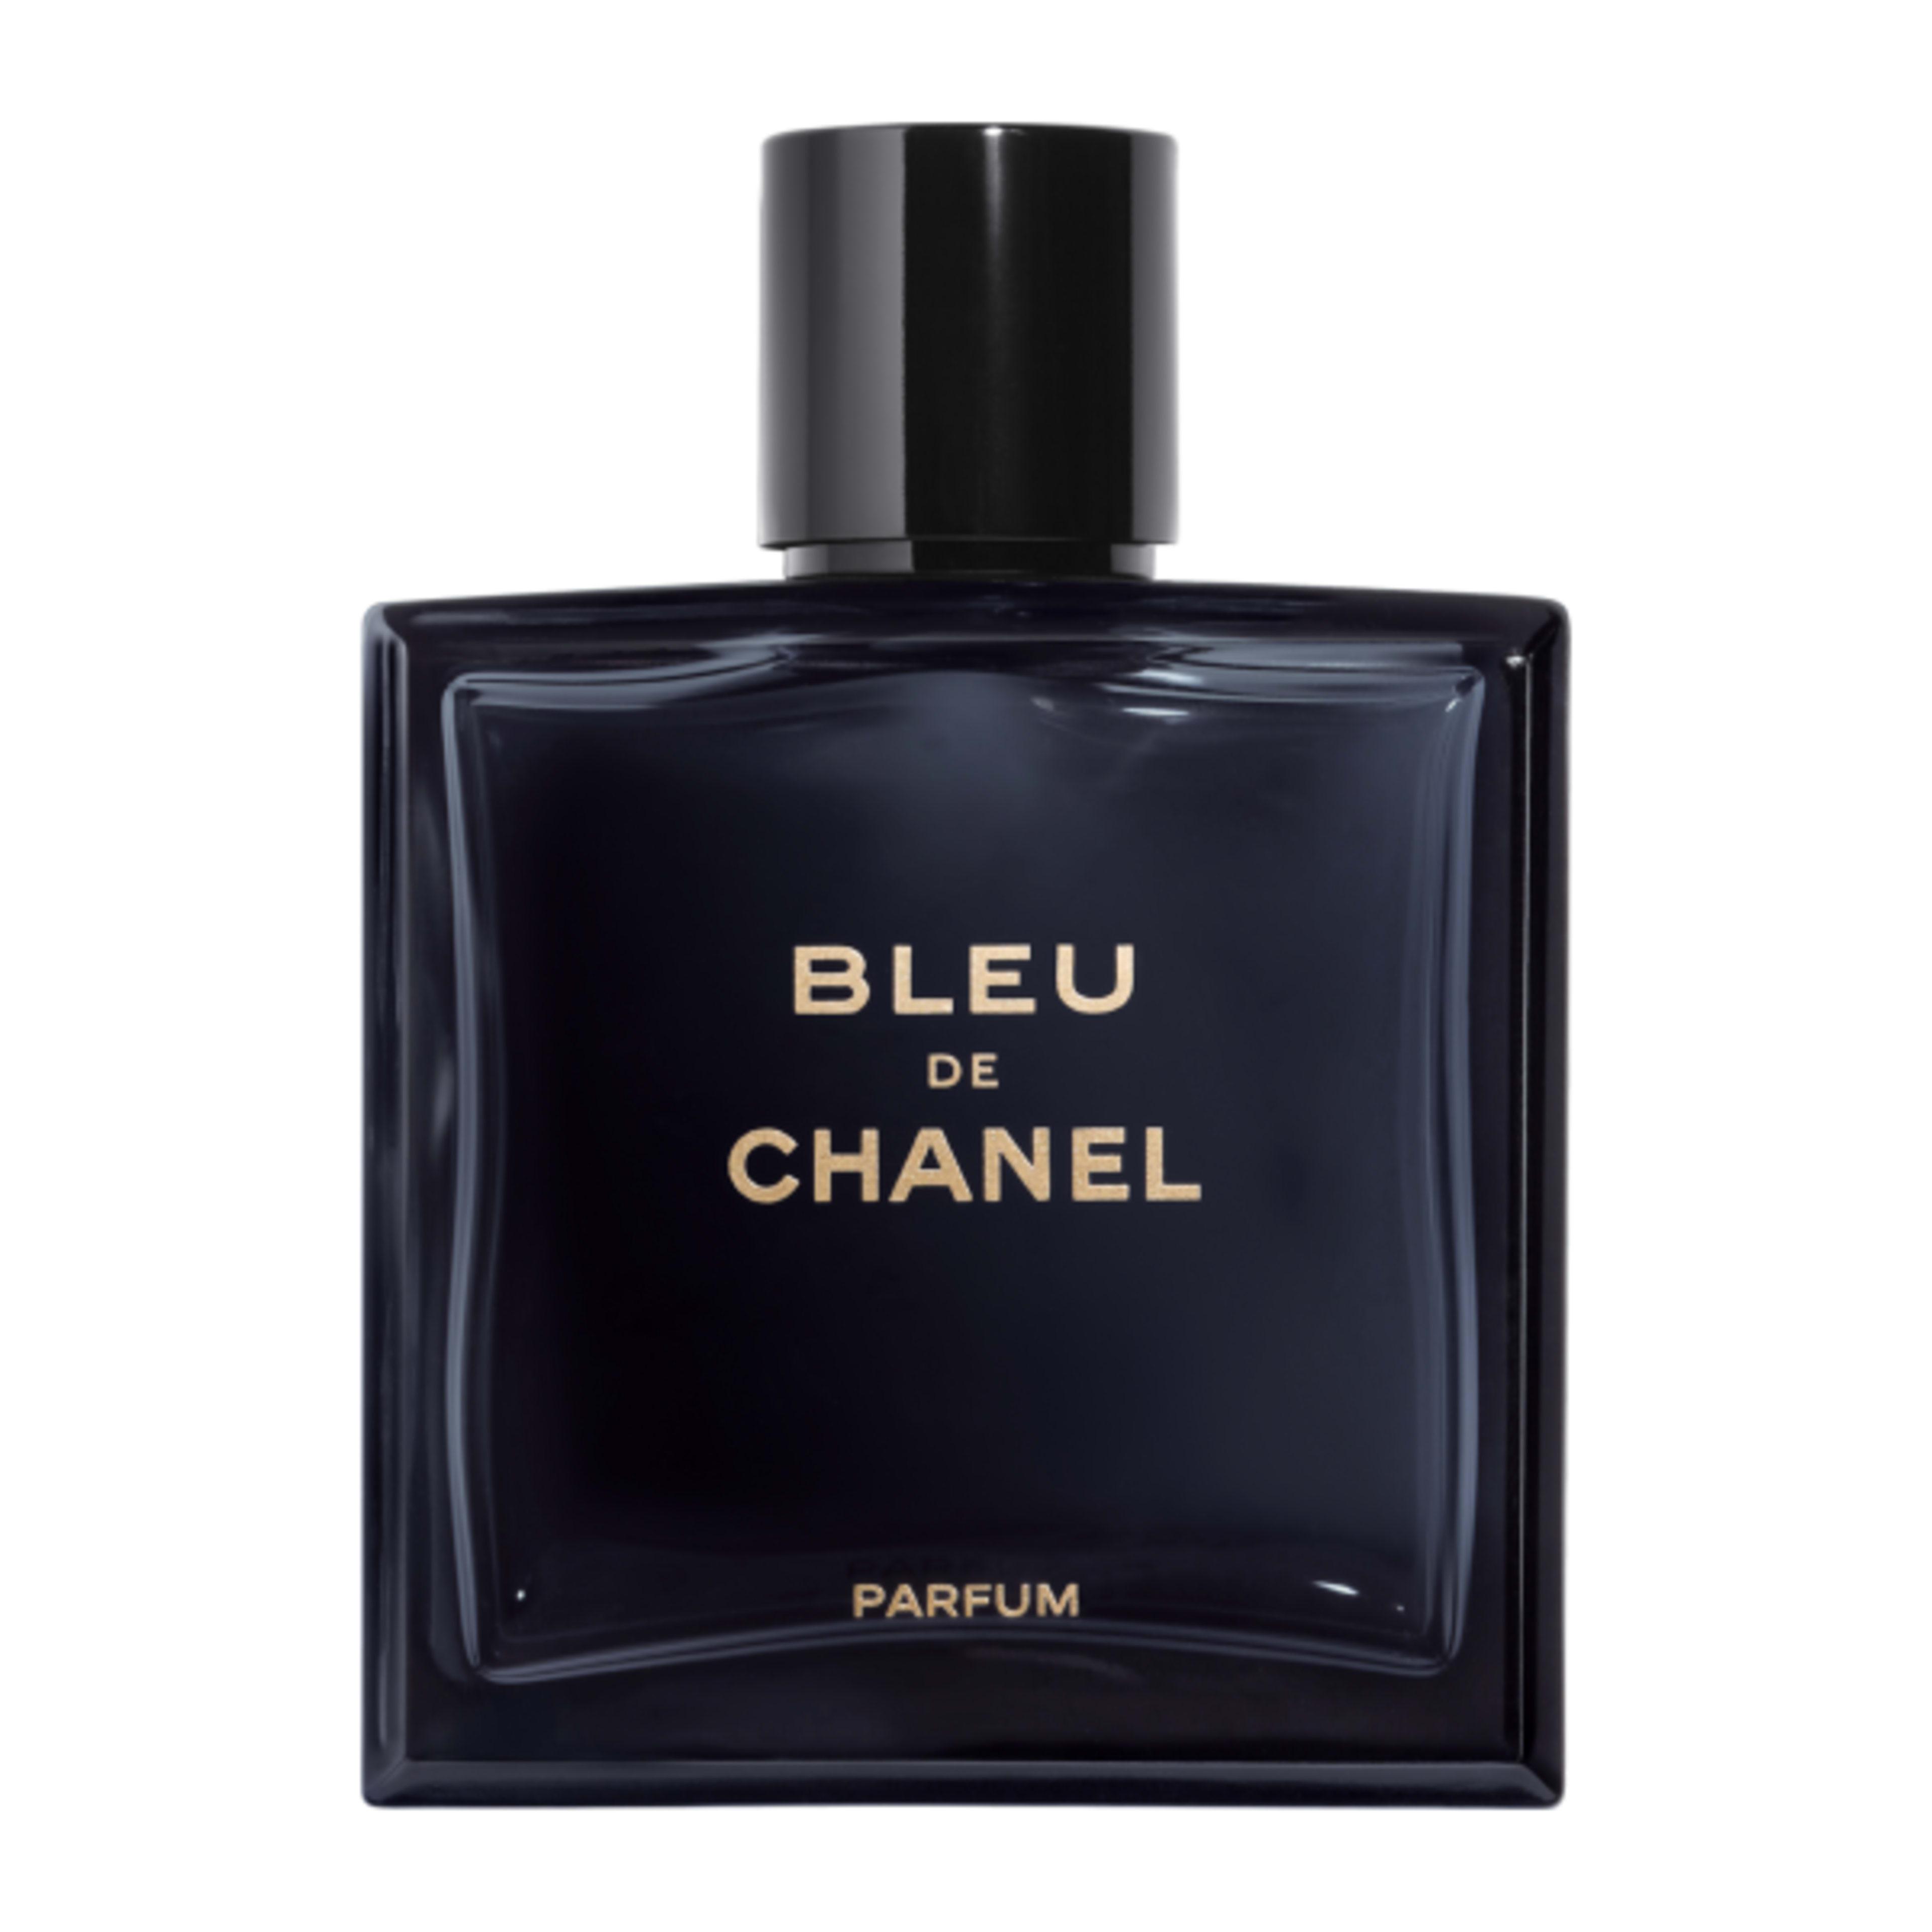 bleu-de-chanel-parfum-spray-3-4fl-oz--packshot-default-107180-8821897232414